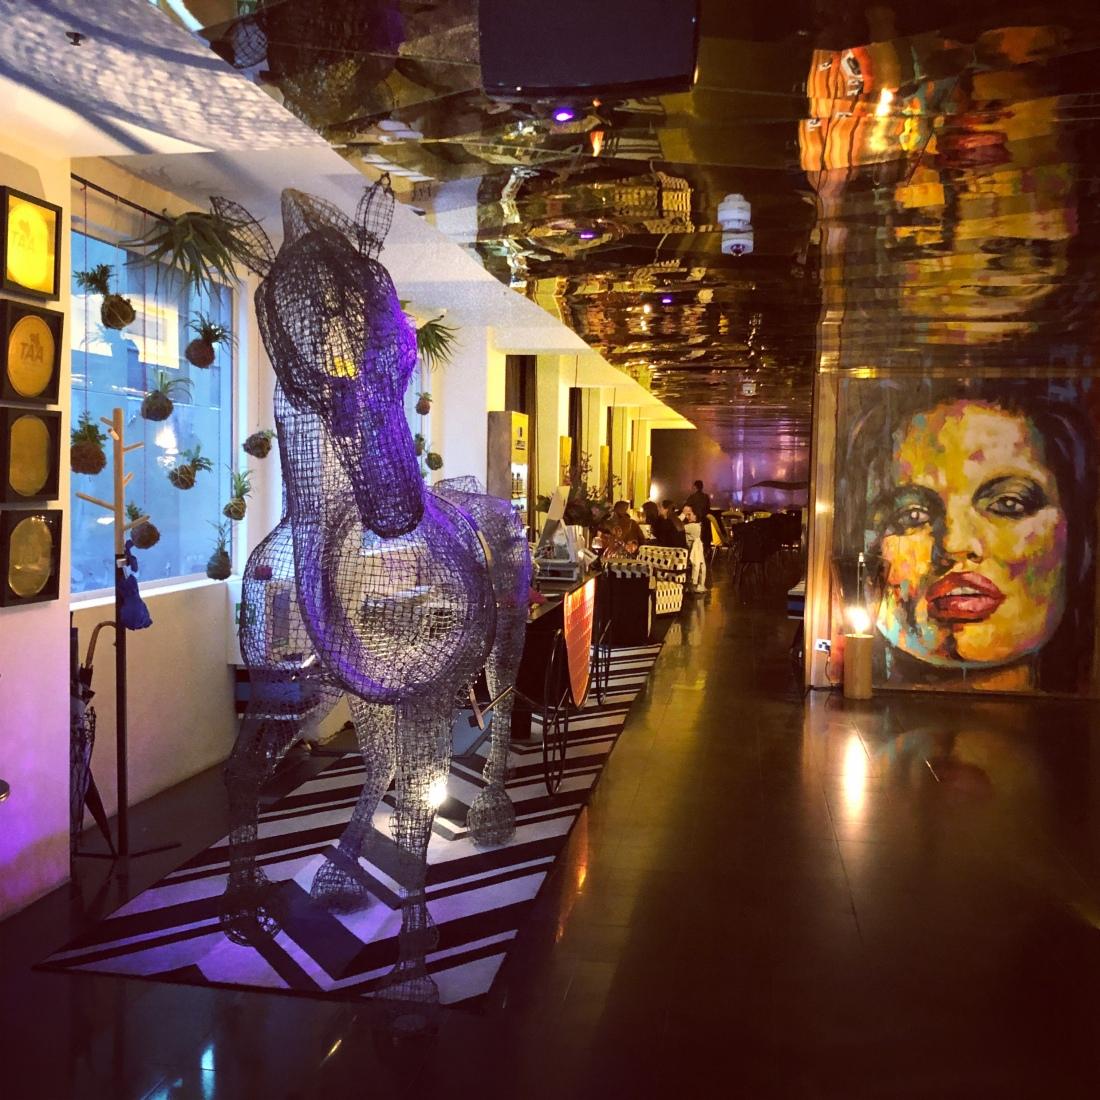 Hotel foyer, Adelphi Hotel, Melbourne